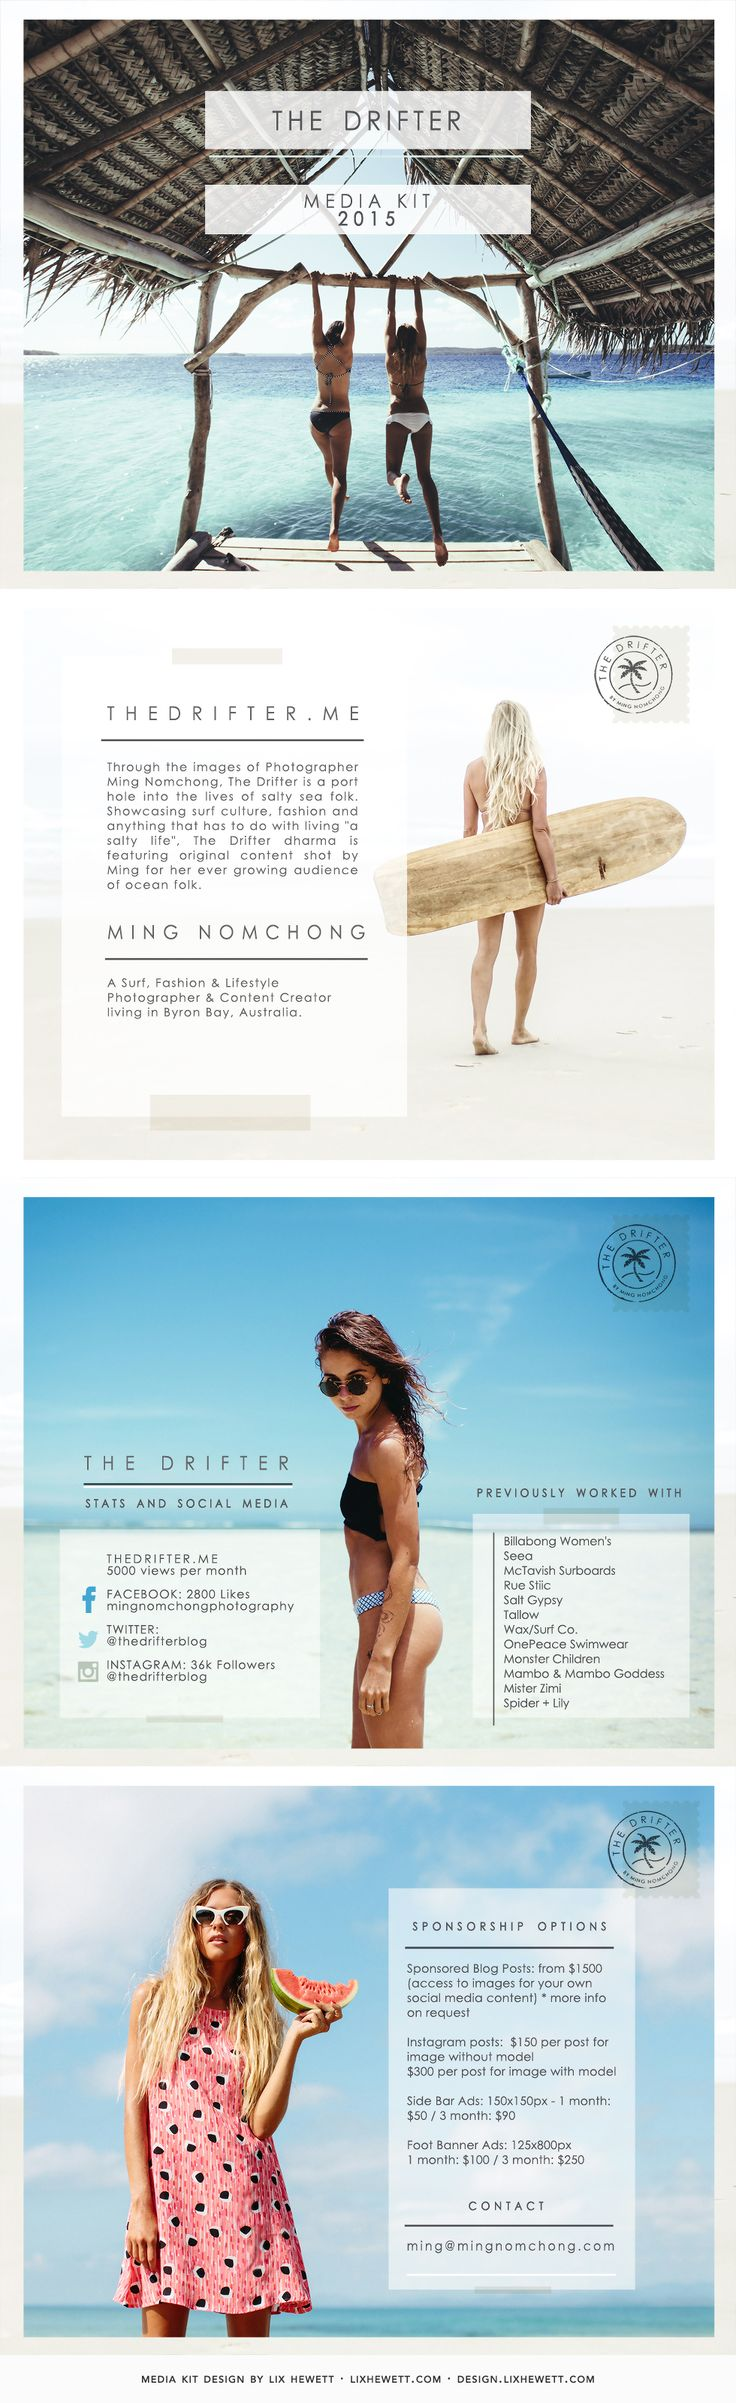 Media Kit Design: The Drifter Travel Blog | Lix Hewett Design